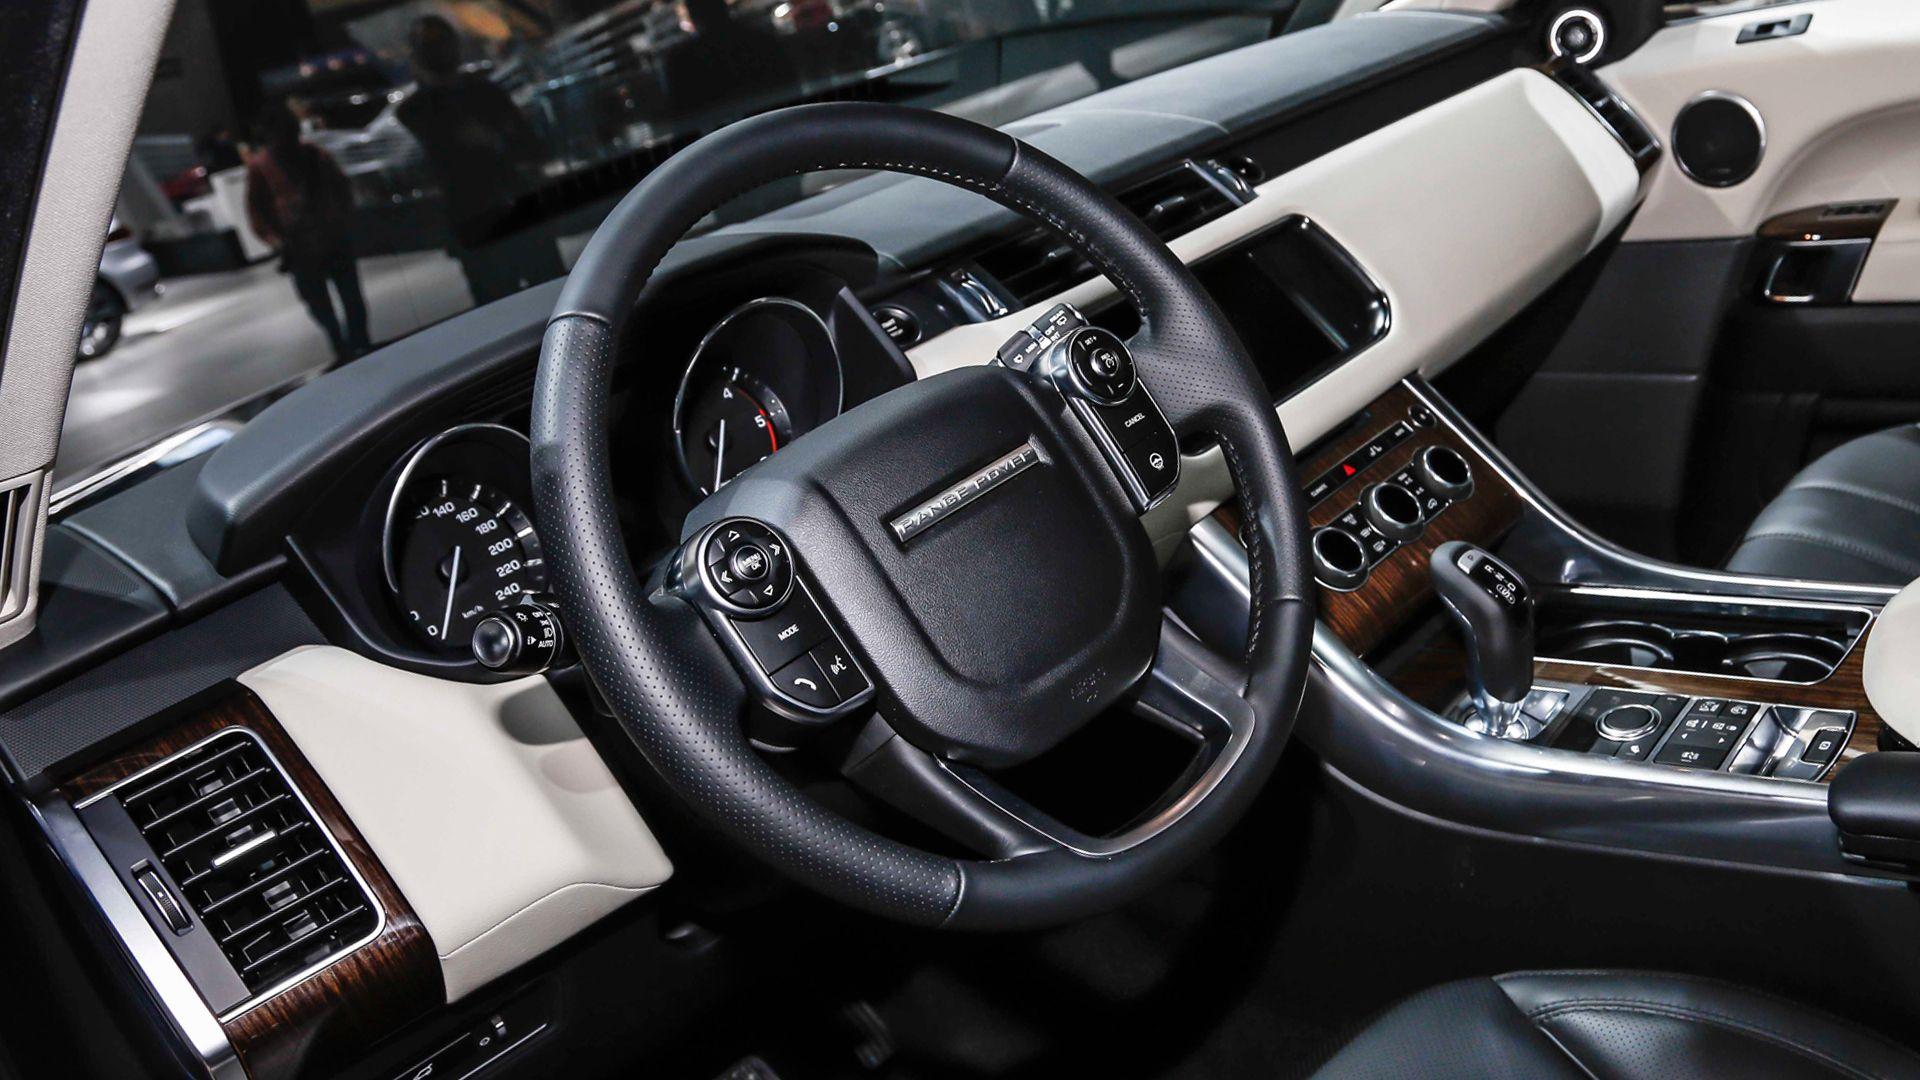 2019 Range Rover Sport Interior Design Land Rover Land Rover Discovery Sport Range Rover Sport